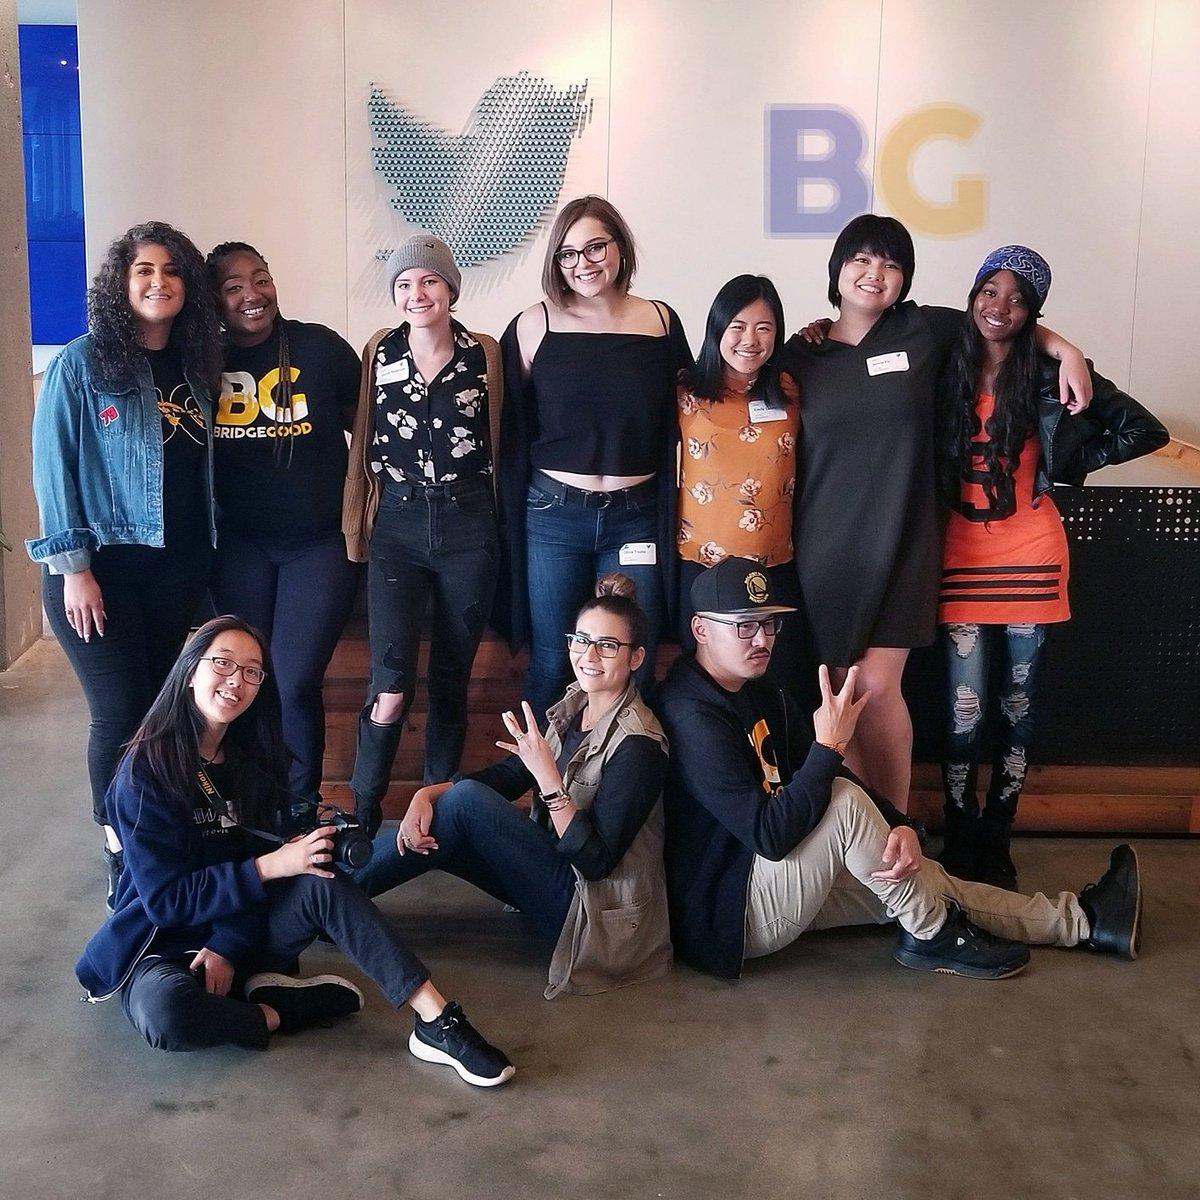 Down with ya till the very end... #ODsquadd x #BGsquadd x #OaklandDigital x #BRIDGEGOOD x #TWMTDW x #LoveWhereYouWork x #DesignForSocialGood | Join the #creativity movement &amp; #dopest ecosystem at http://www. bridgegood.com  &nbsp;  <br>http://pic.twitter.com/SF27pWnqP7